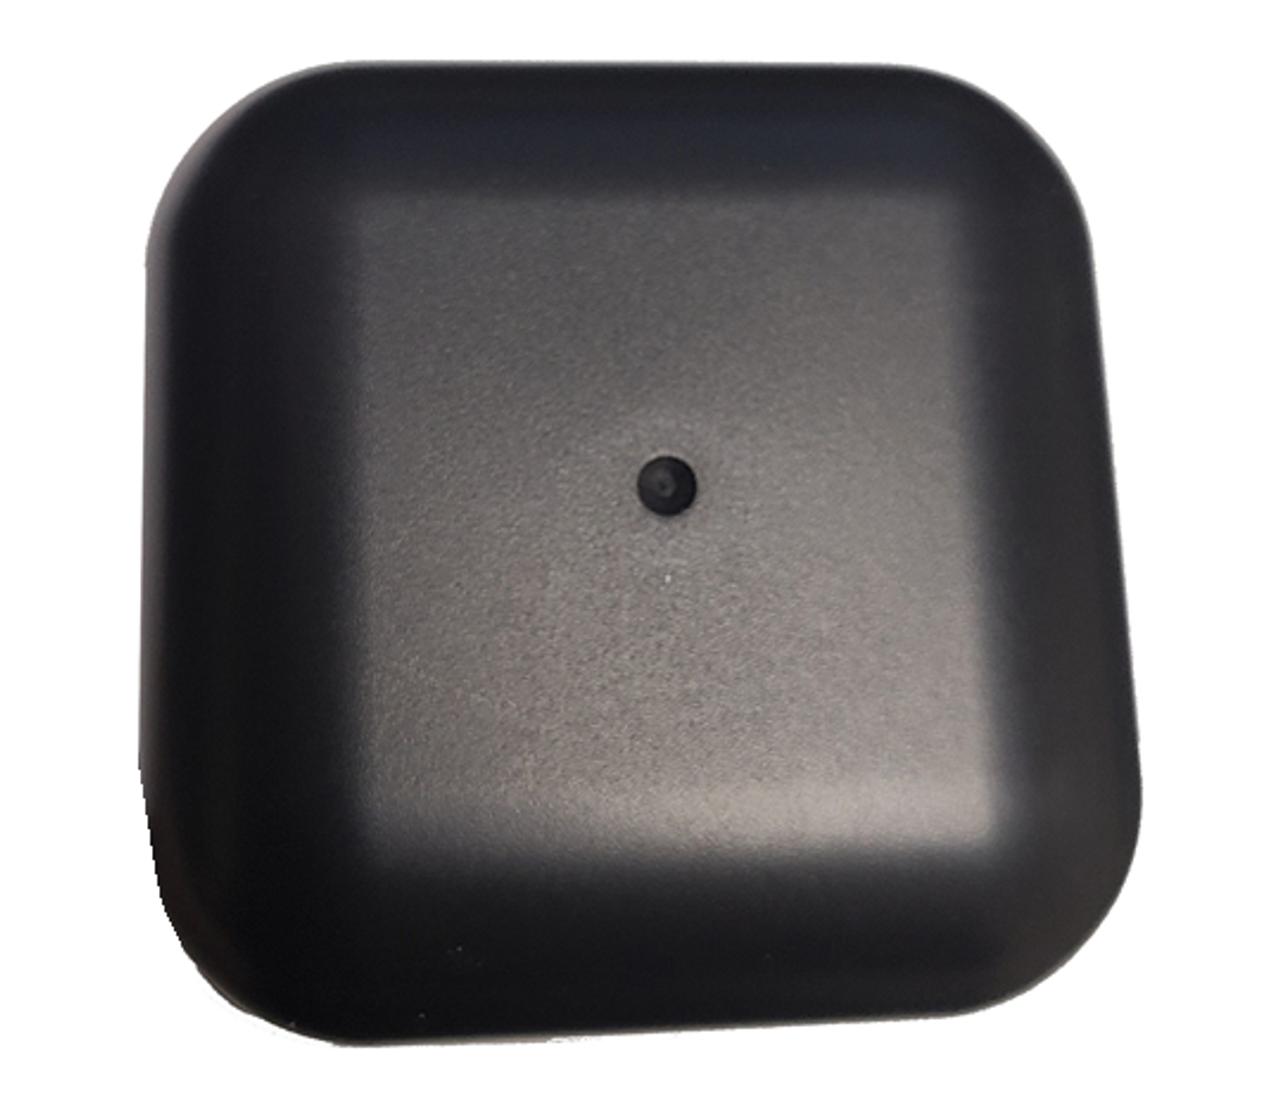 M400 Low Profile Series Antenna - Top View